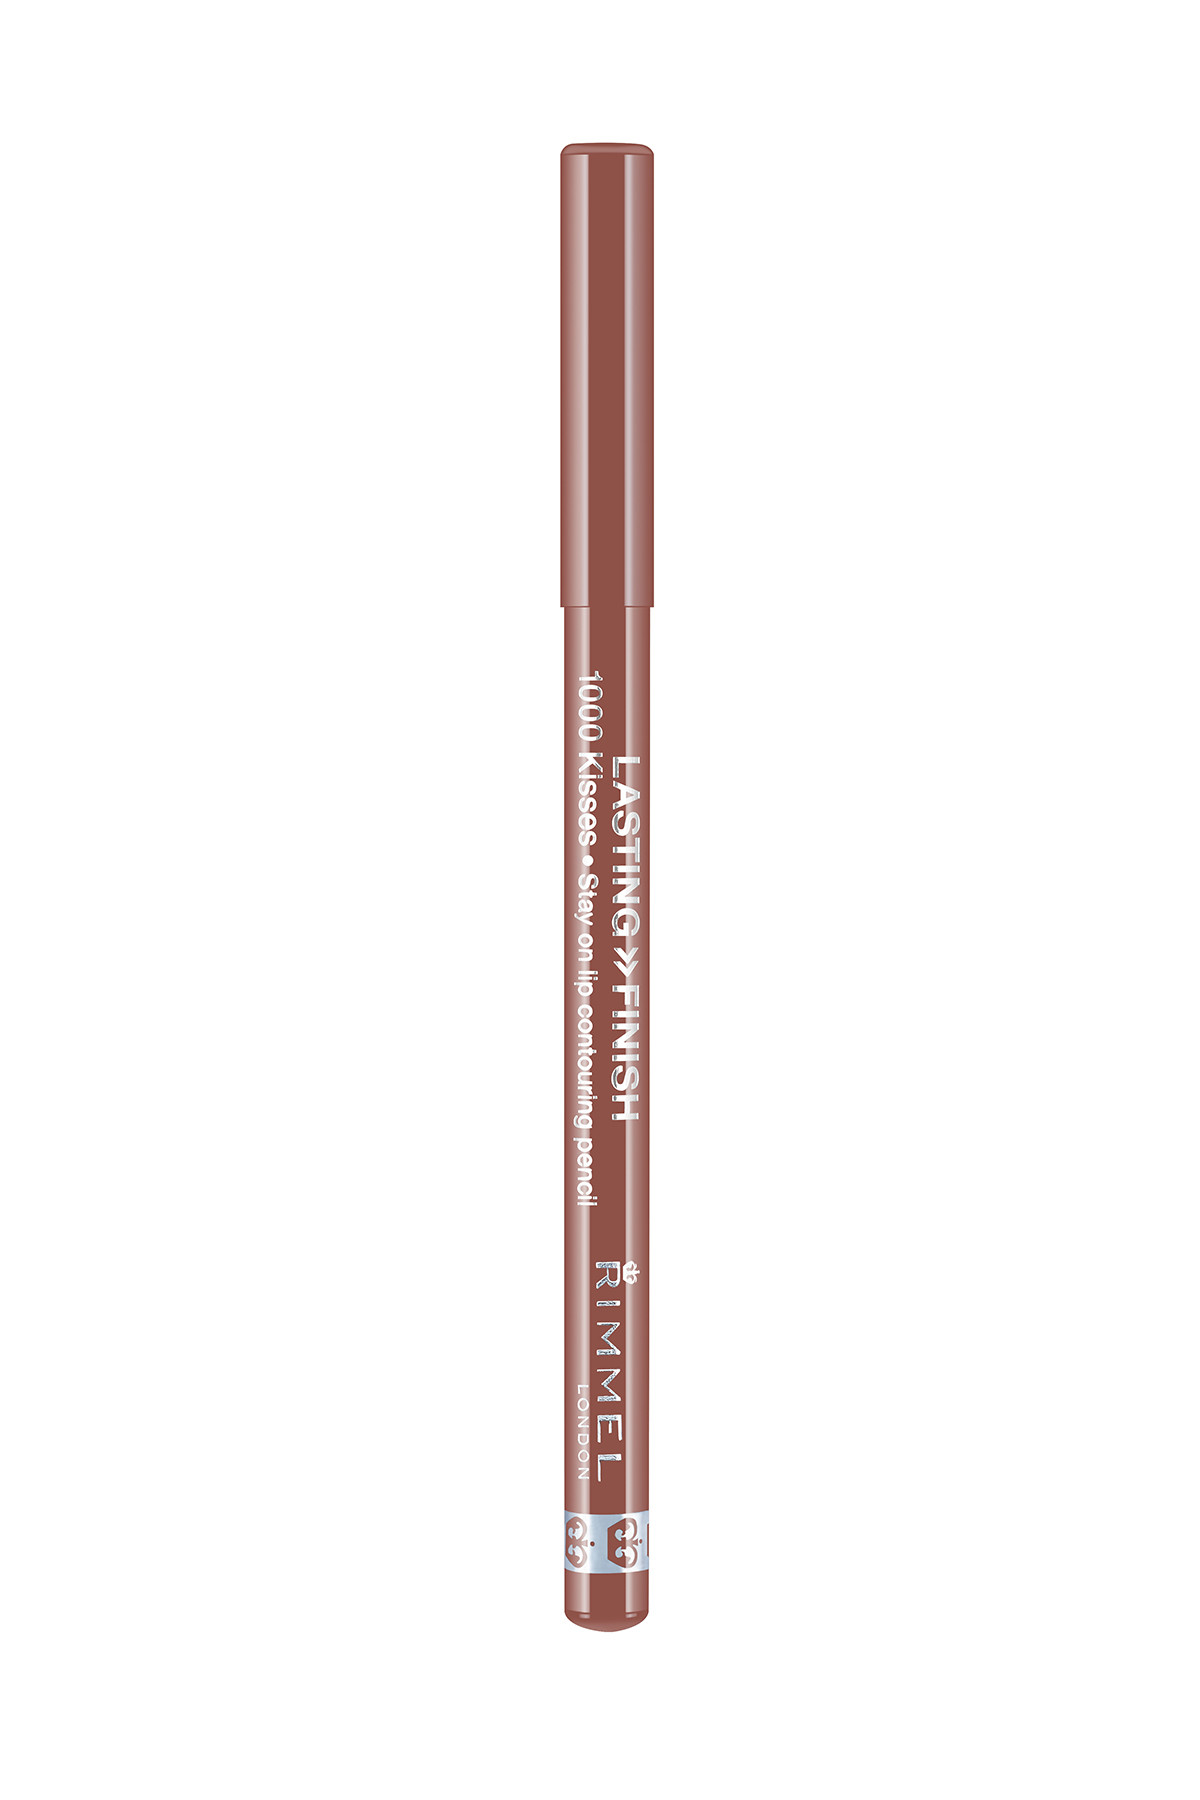 RIMMEL LONDON Dudak Kalemi - Lasting Finish 1000 Kisses Lip Liner 050 Tiramisu 1,2 g 5012874027620 2